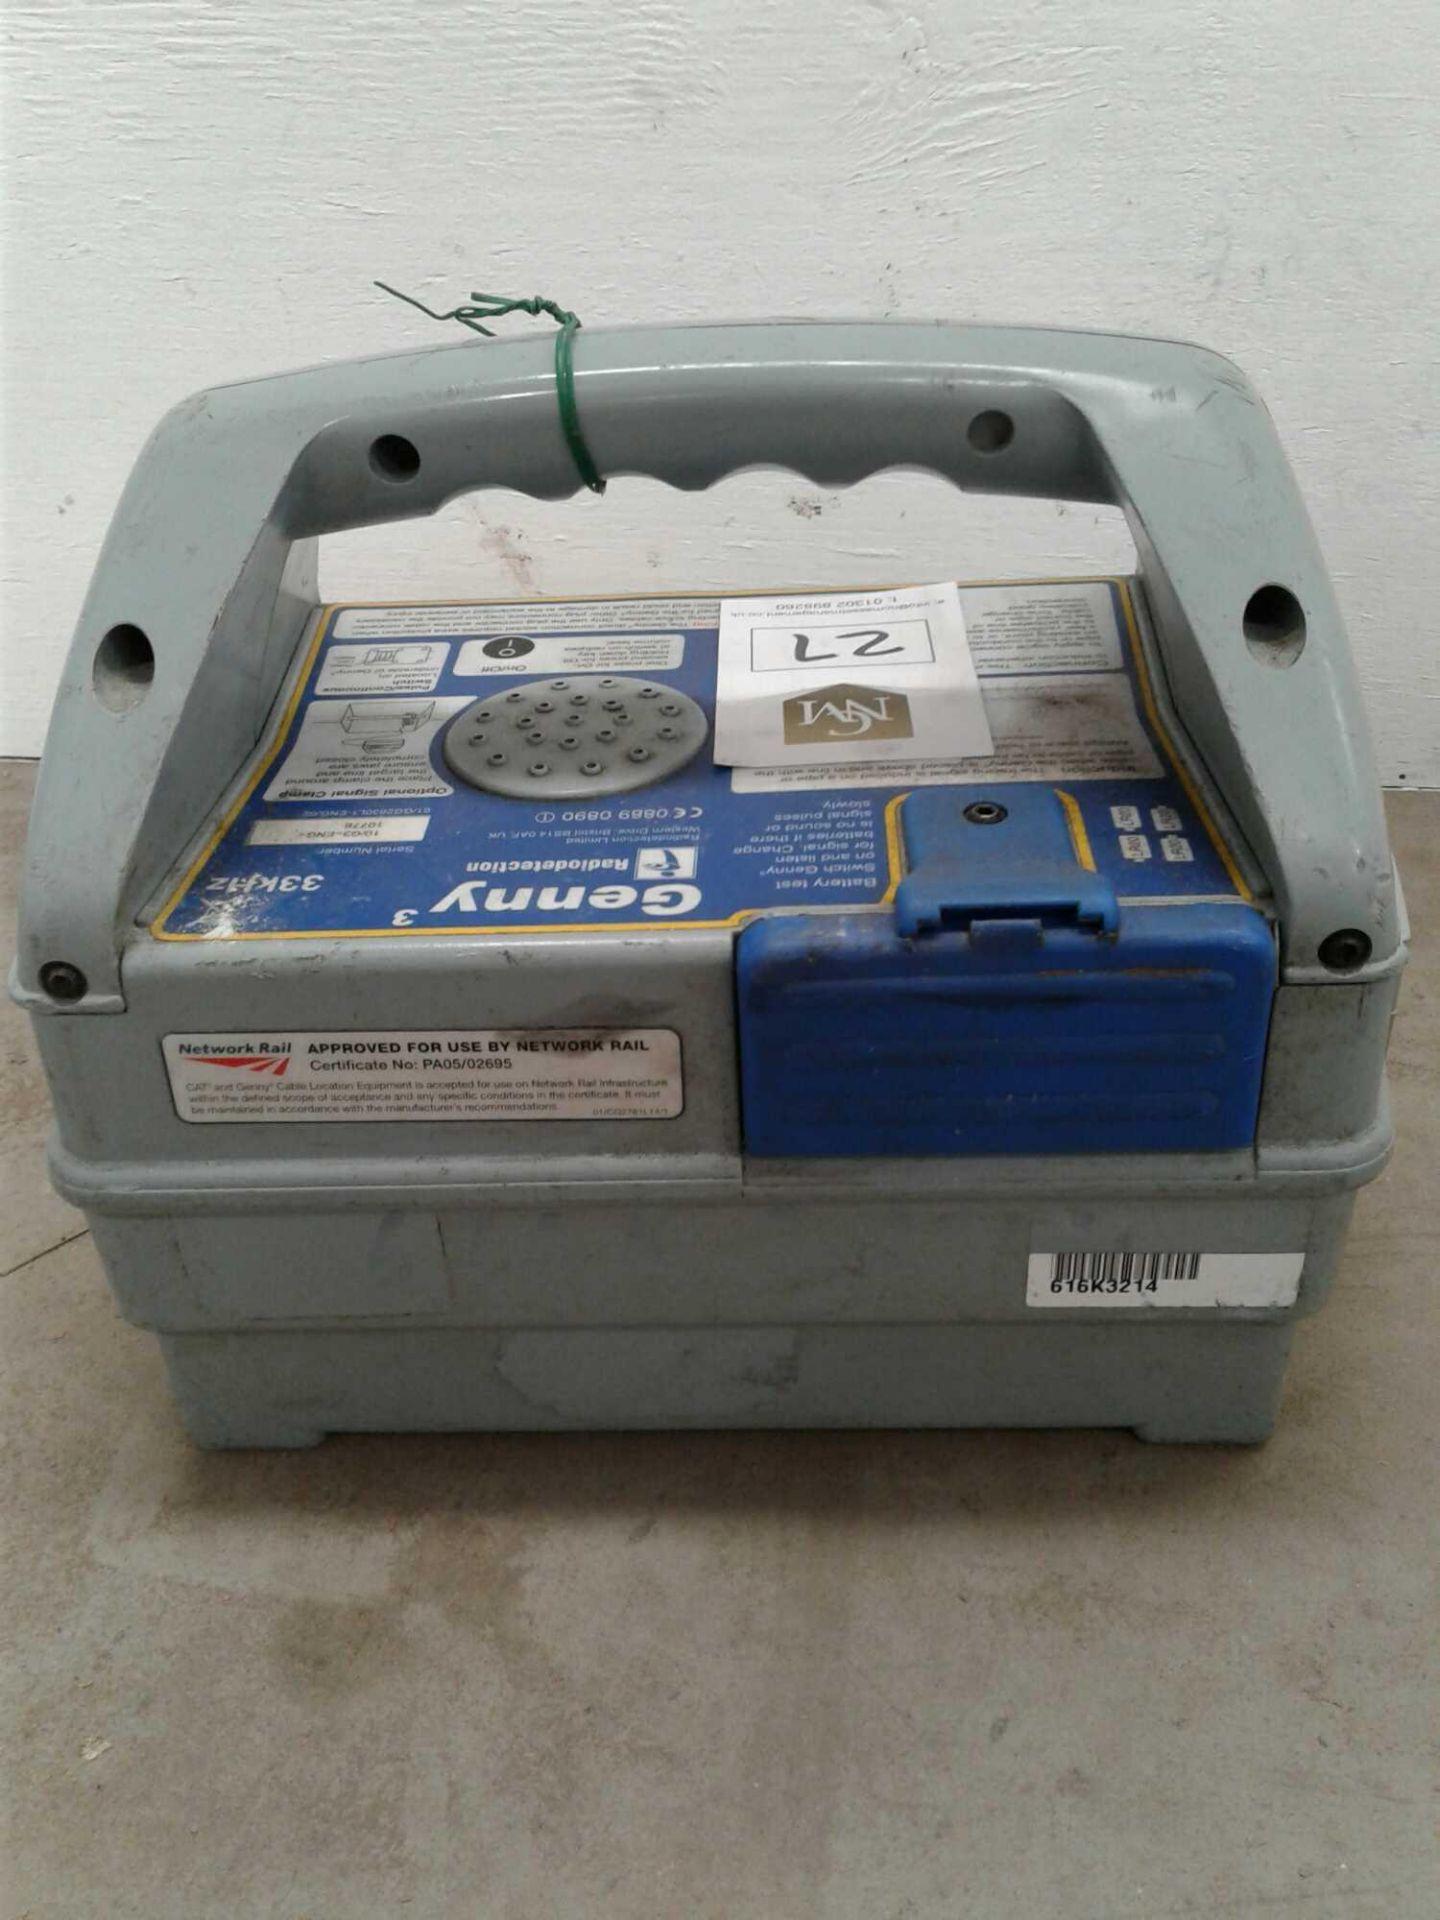 Lot 27 - Genny 3 radiodetection unit